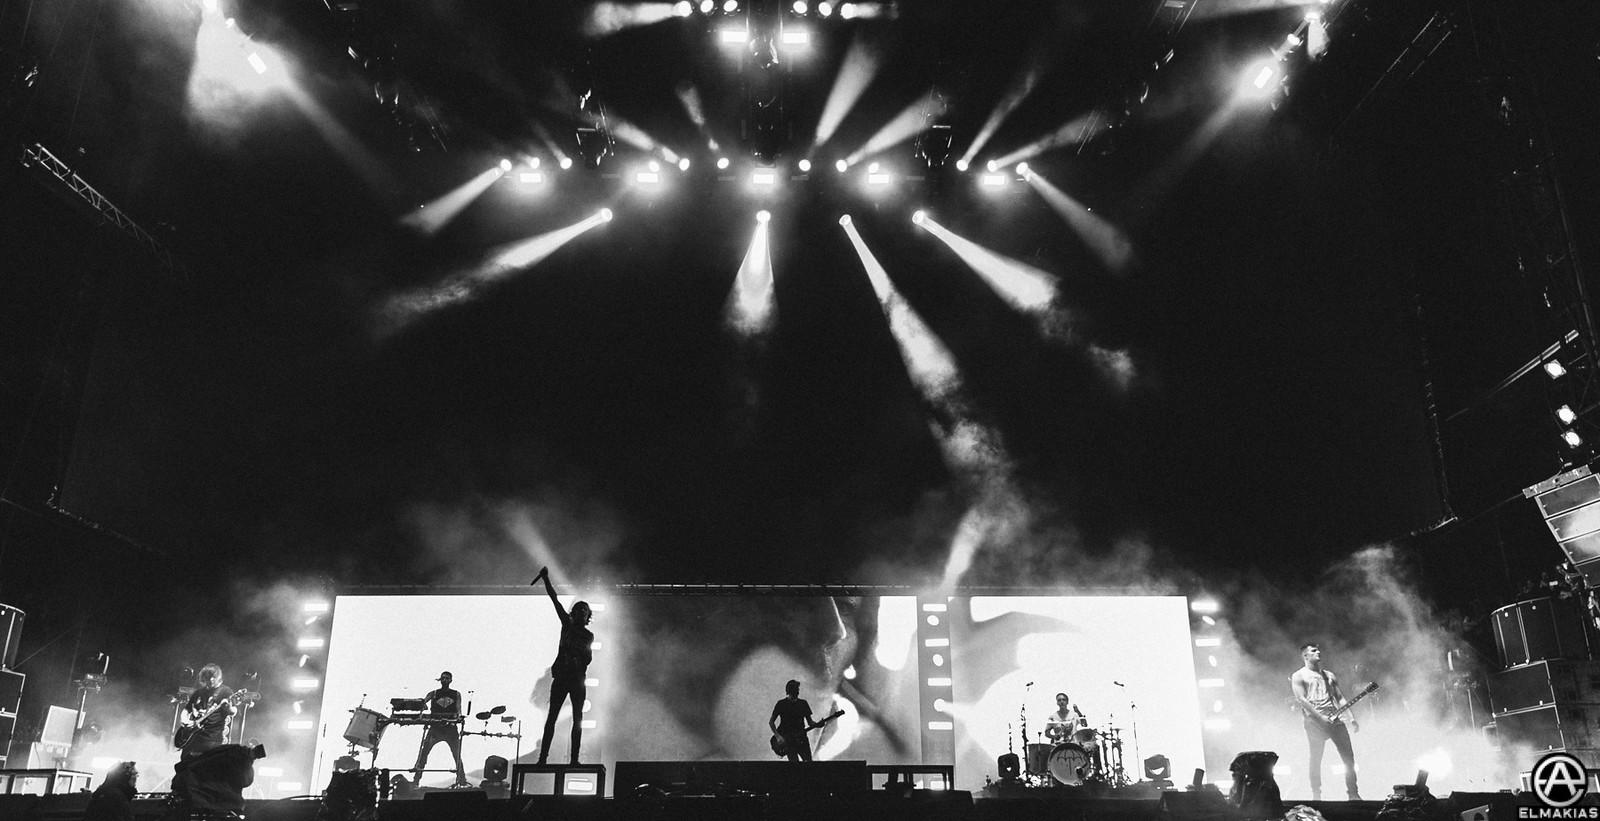 Bring Me The Horizon live at Reading Festival 2015 by Adam Elmakias